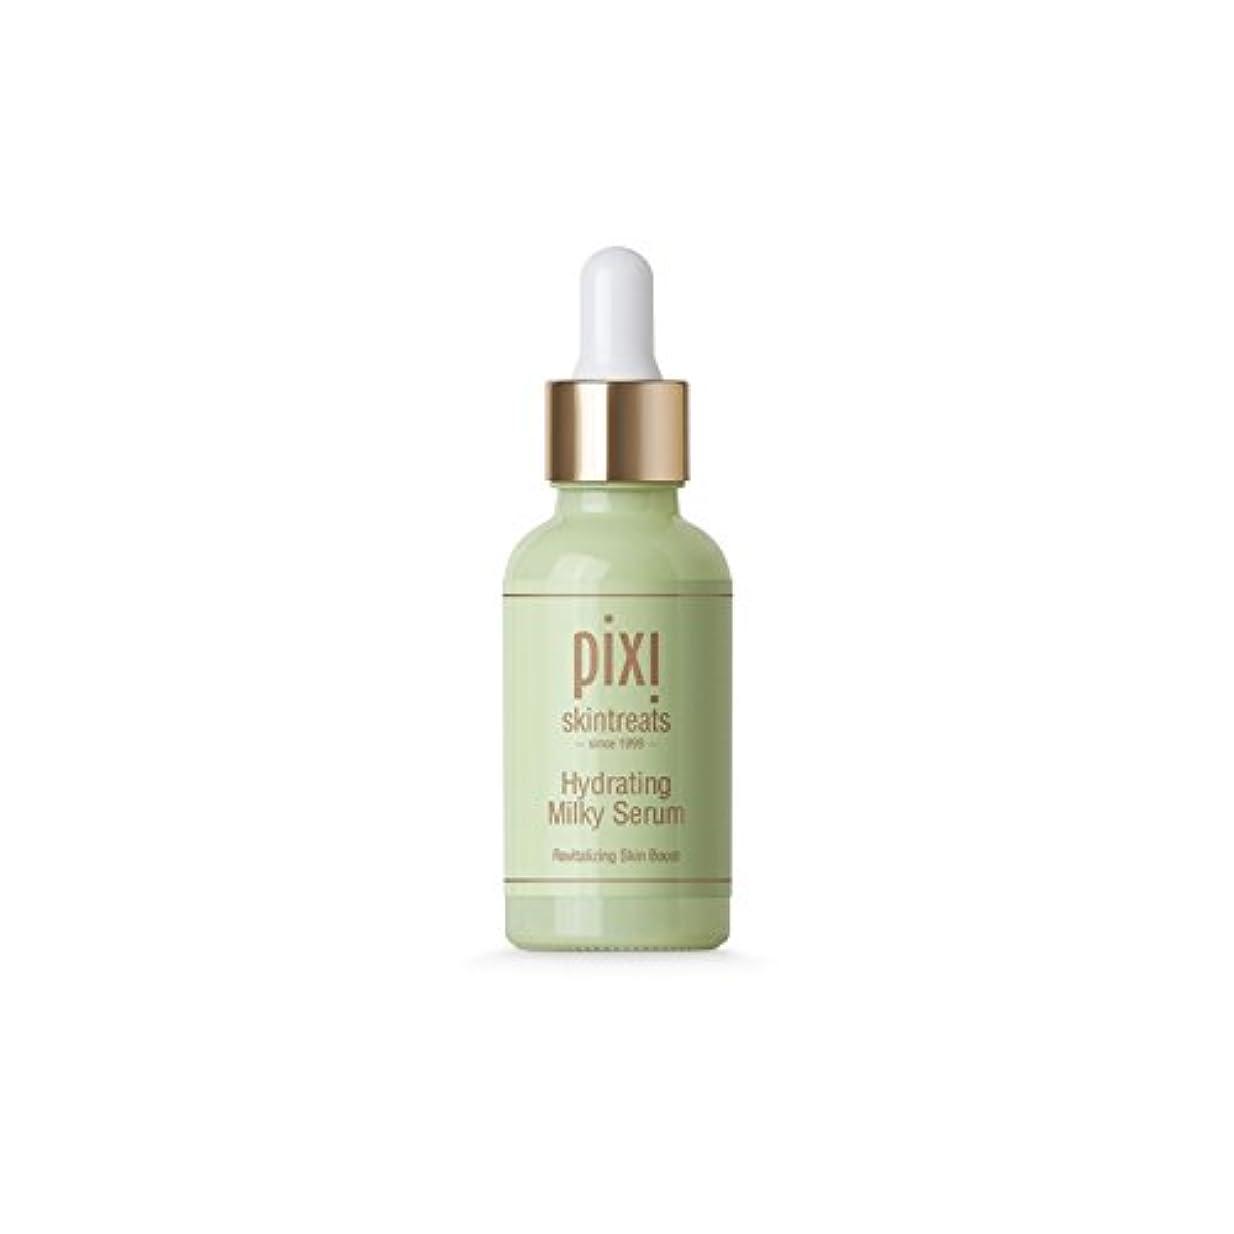 Pixi Hydrating Milky Serum - 乳白色の血清を水和 [並行輸入品]